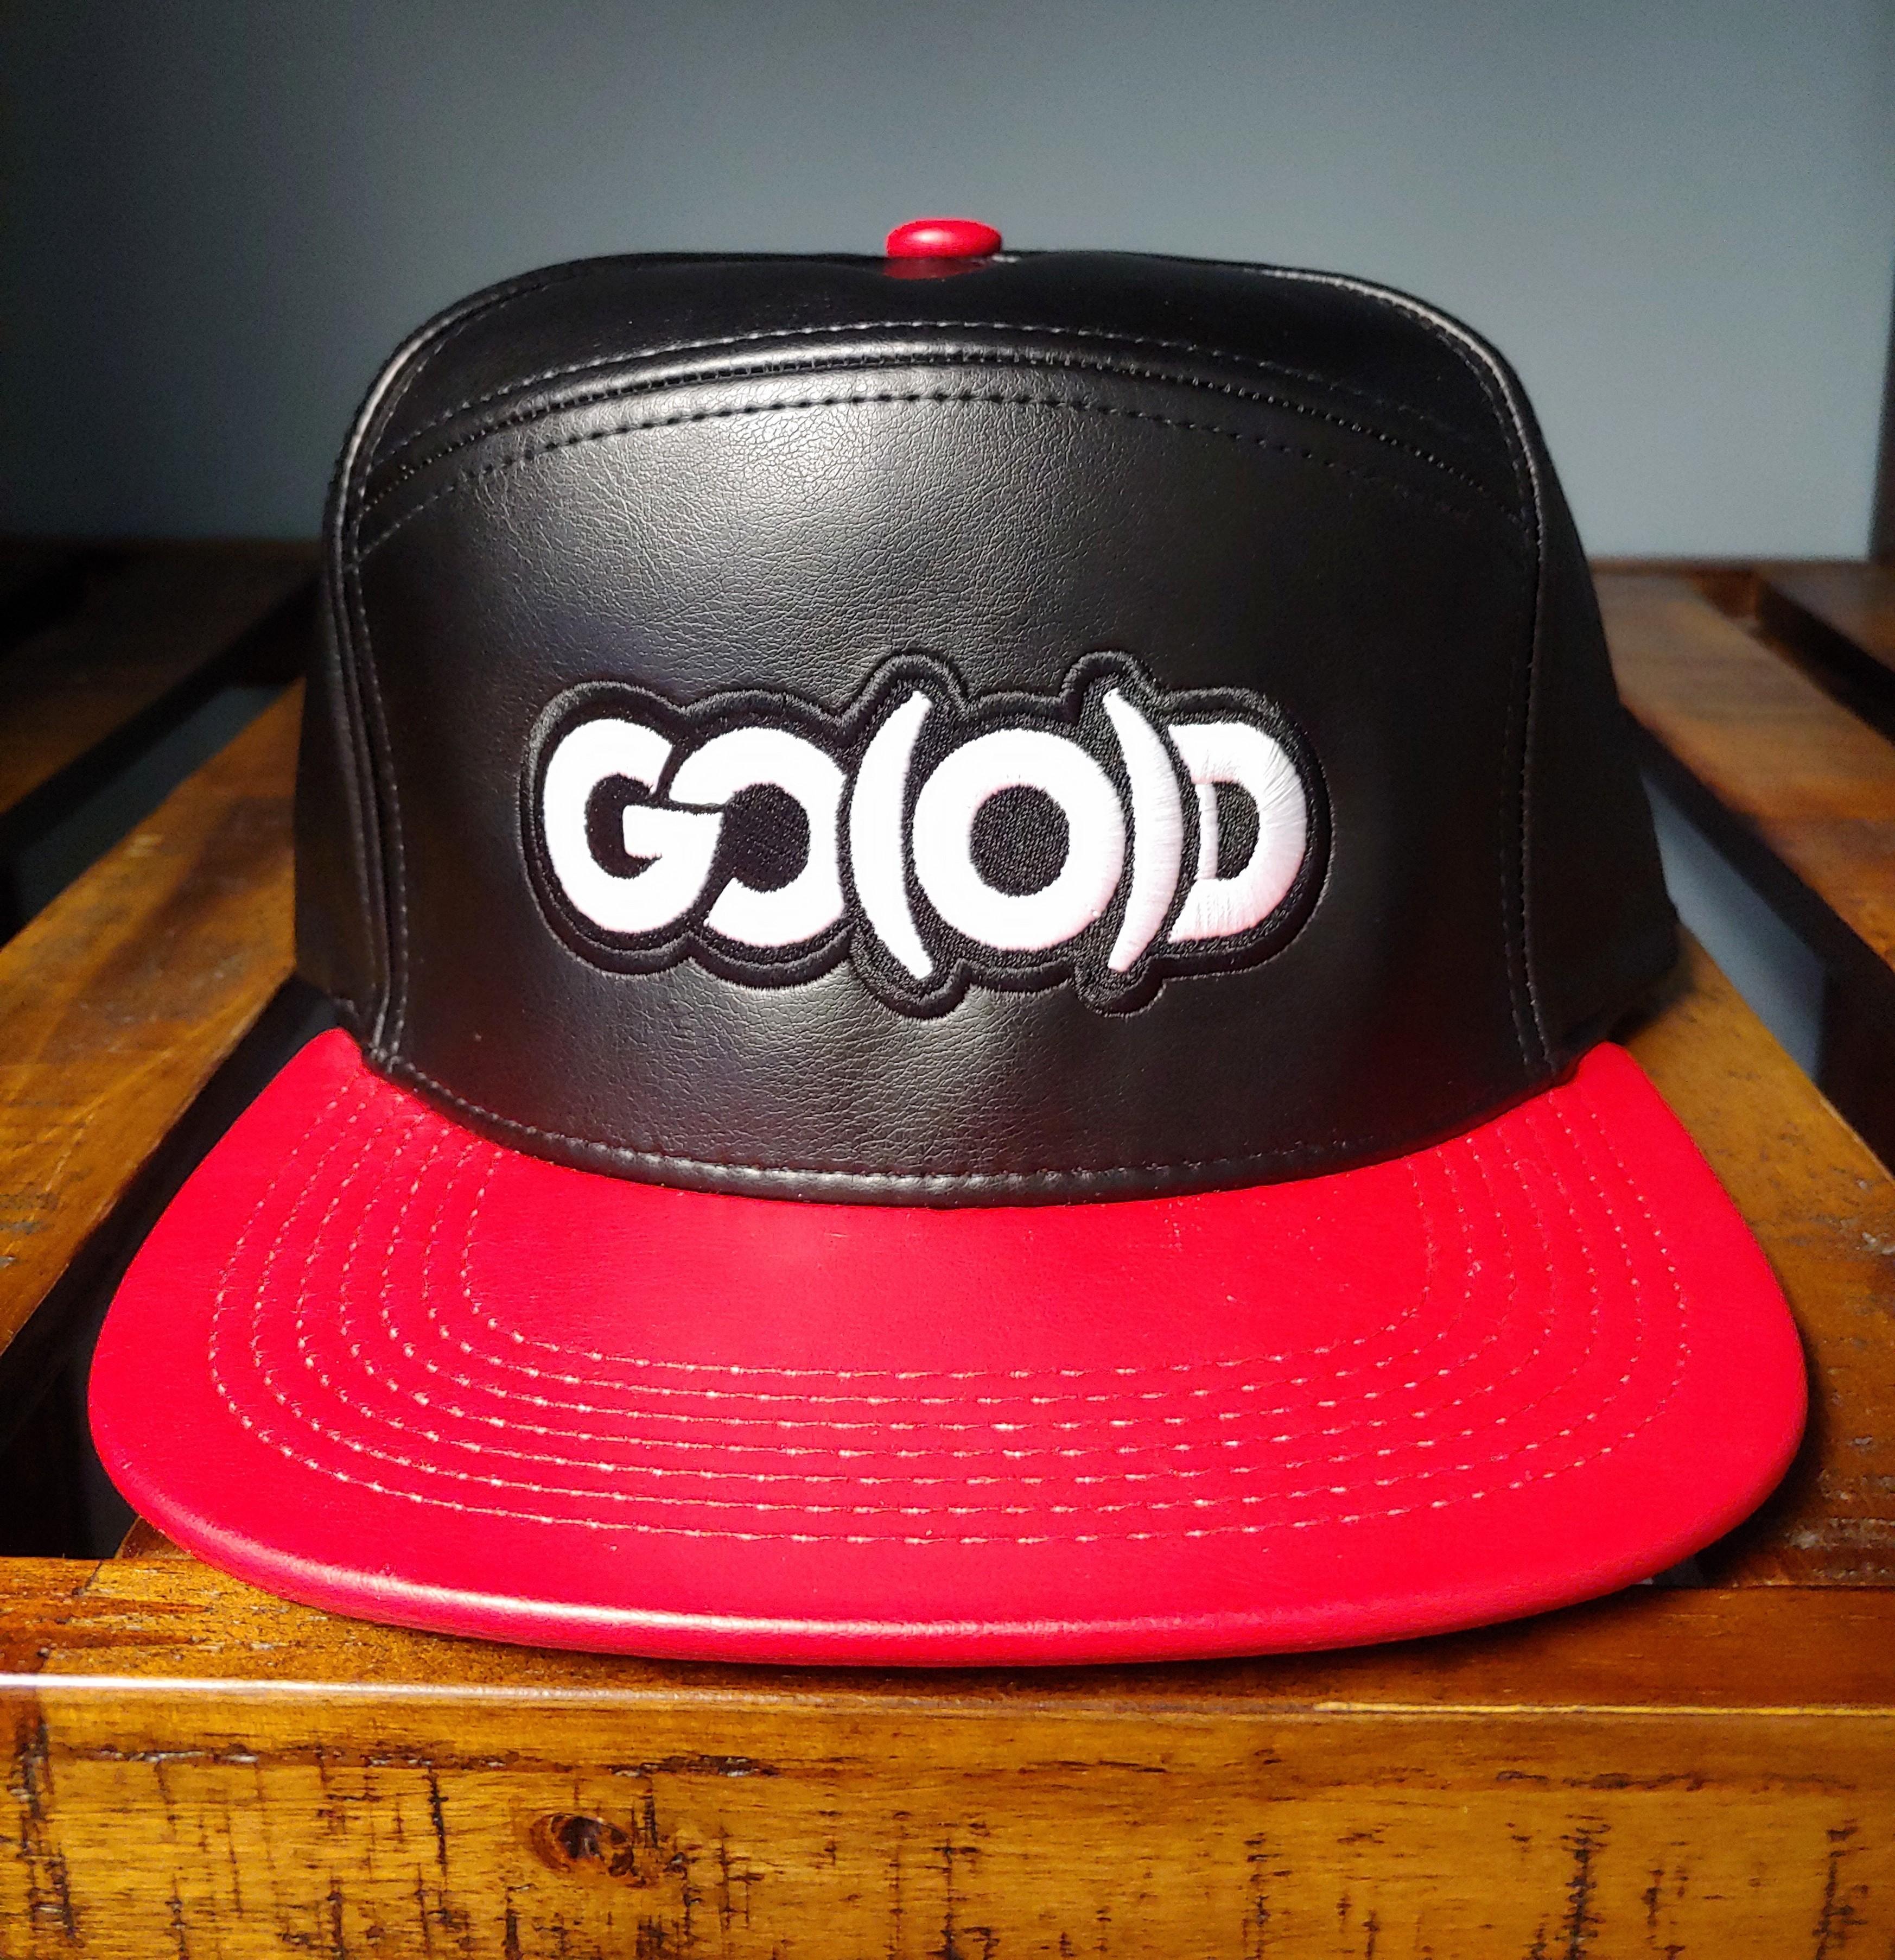 GO(O)D Hybrid Leather Strapback-black/red 00194